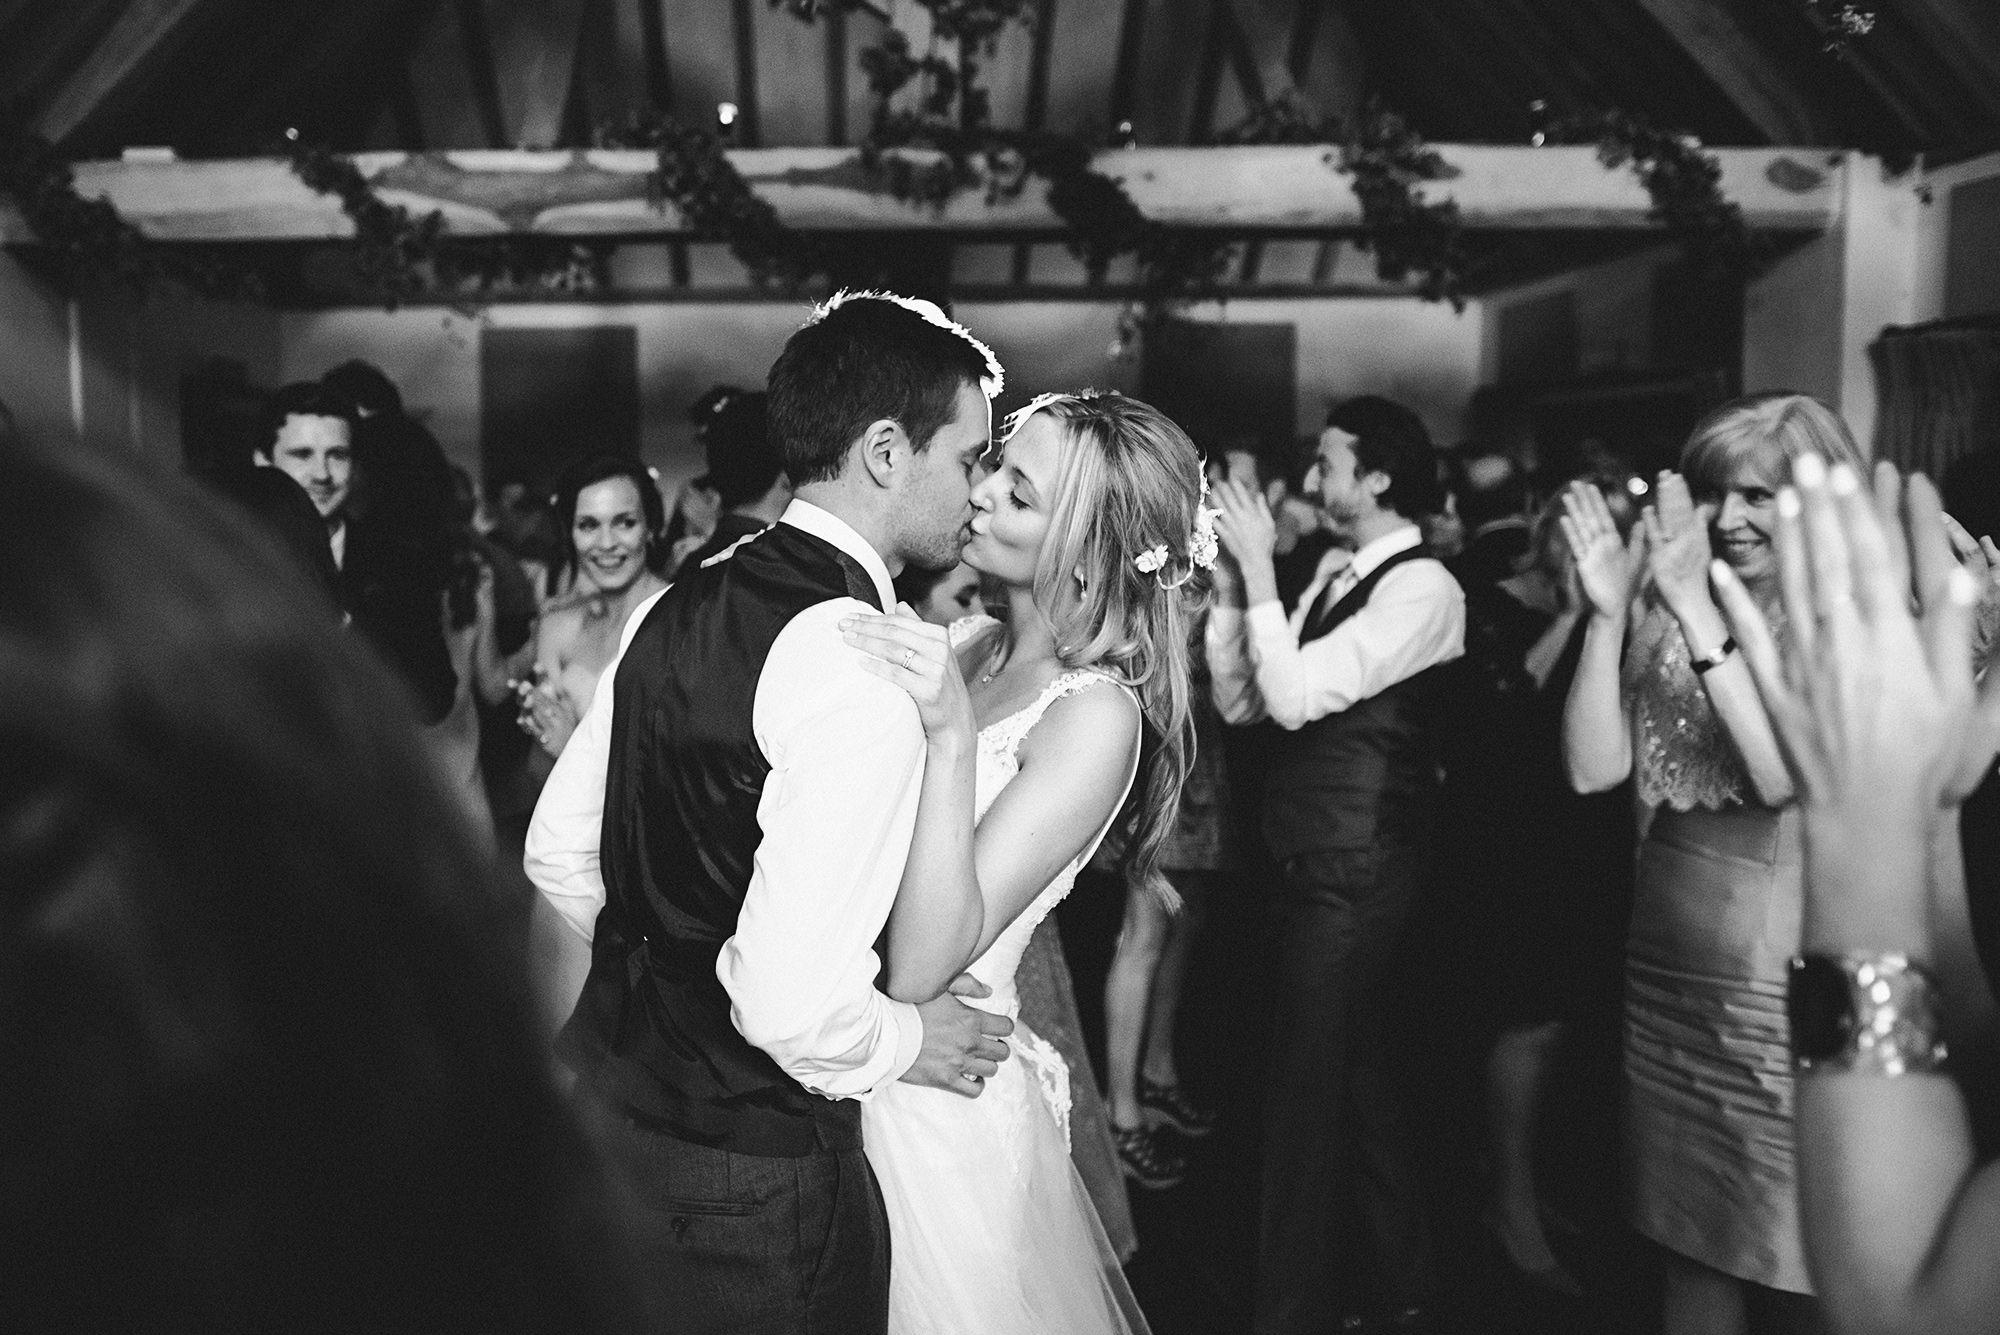 Simon biffen-best of 2015 wedding photographs-32